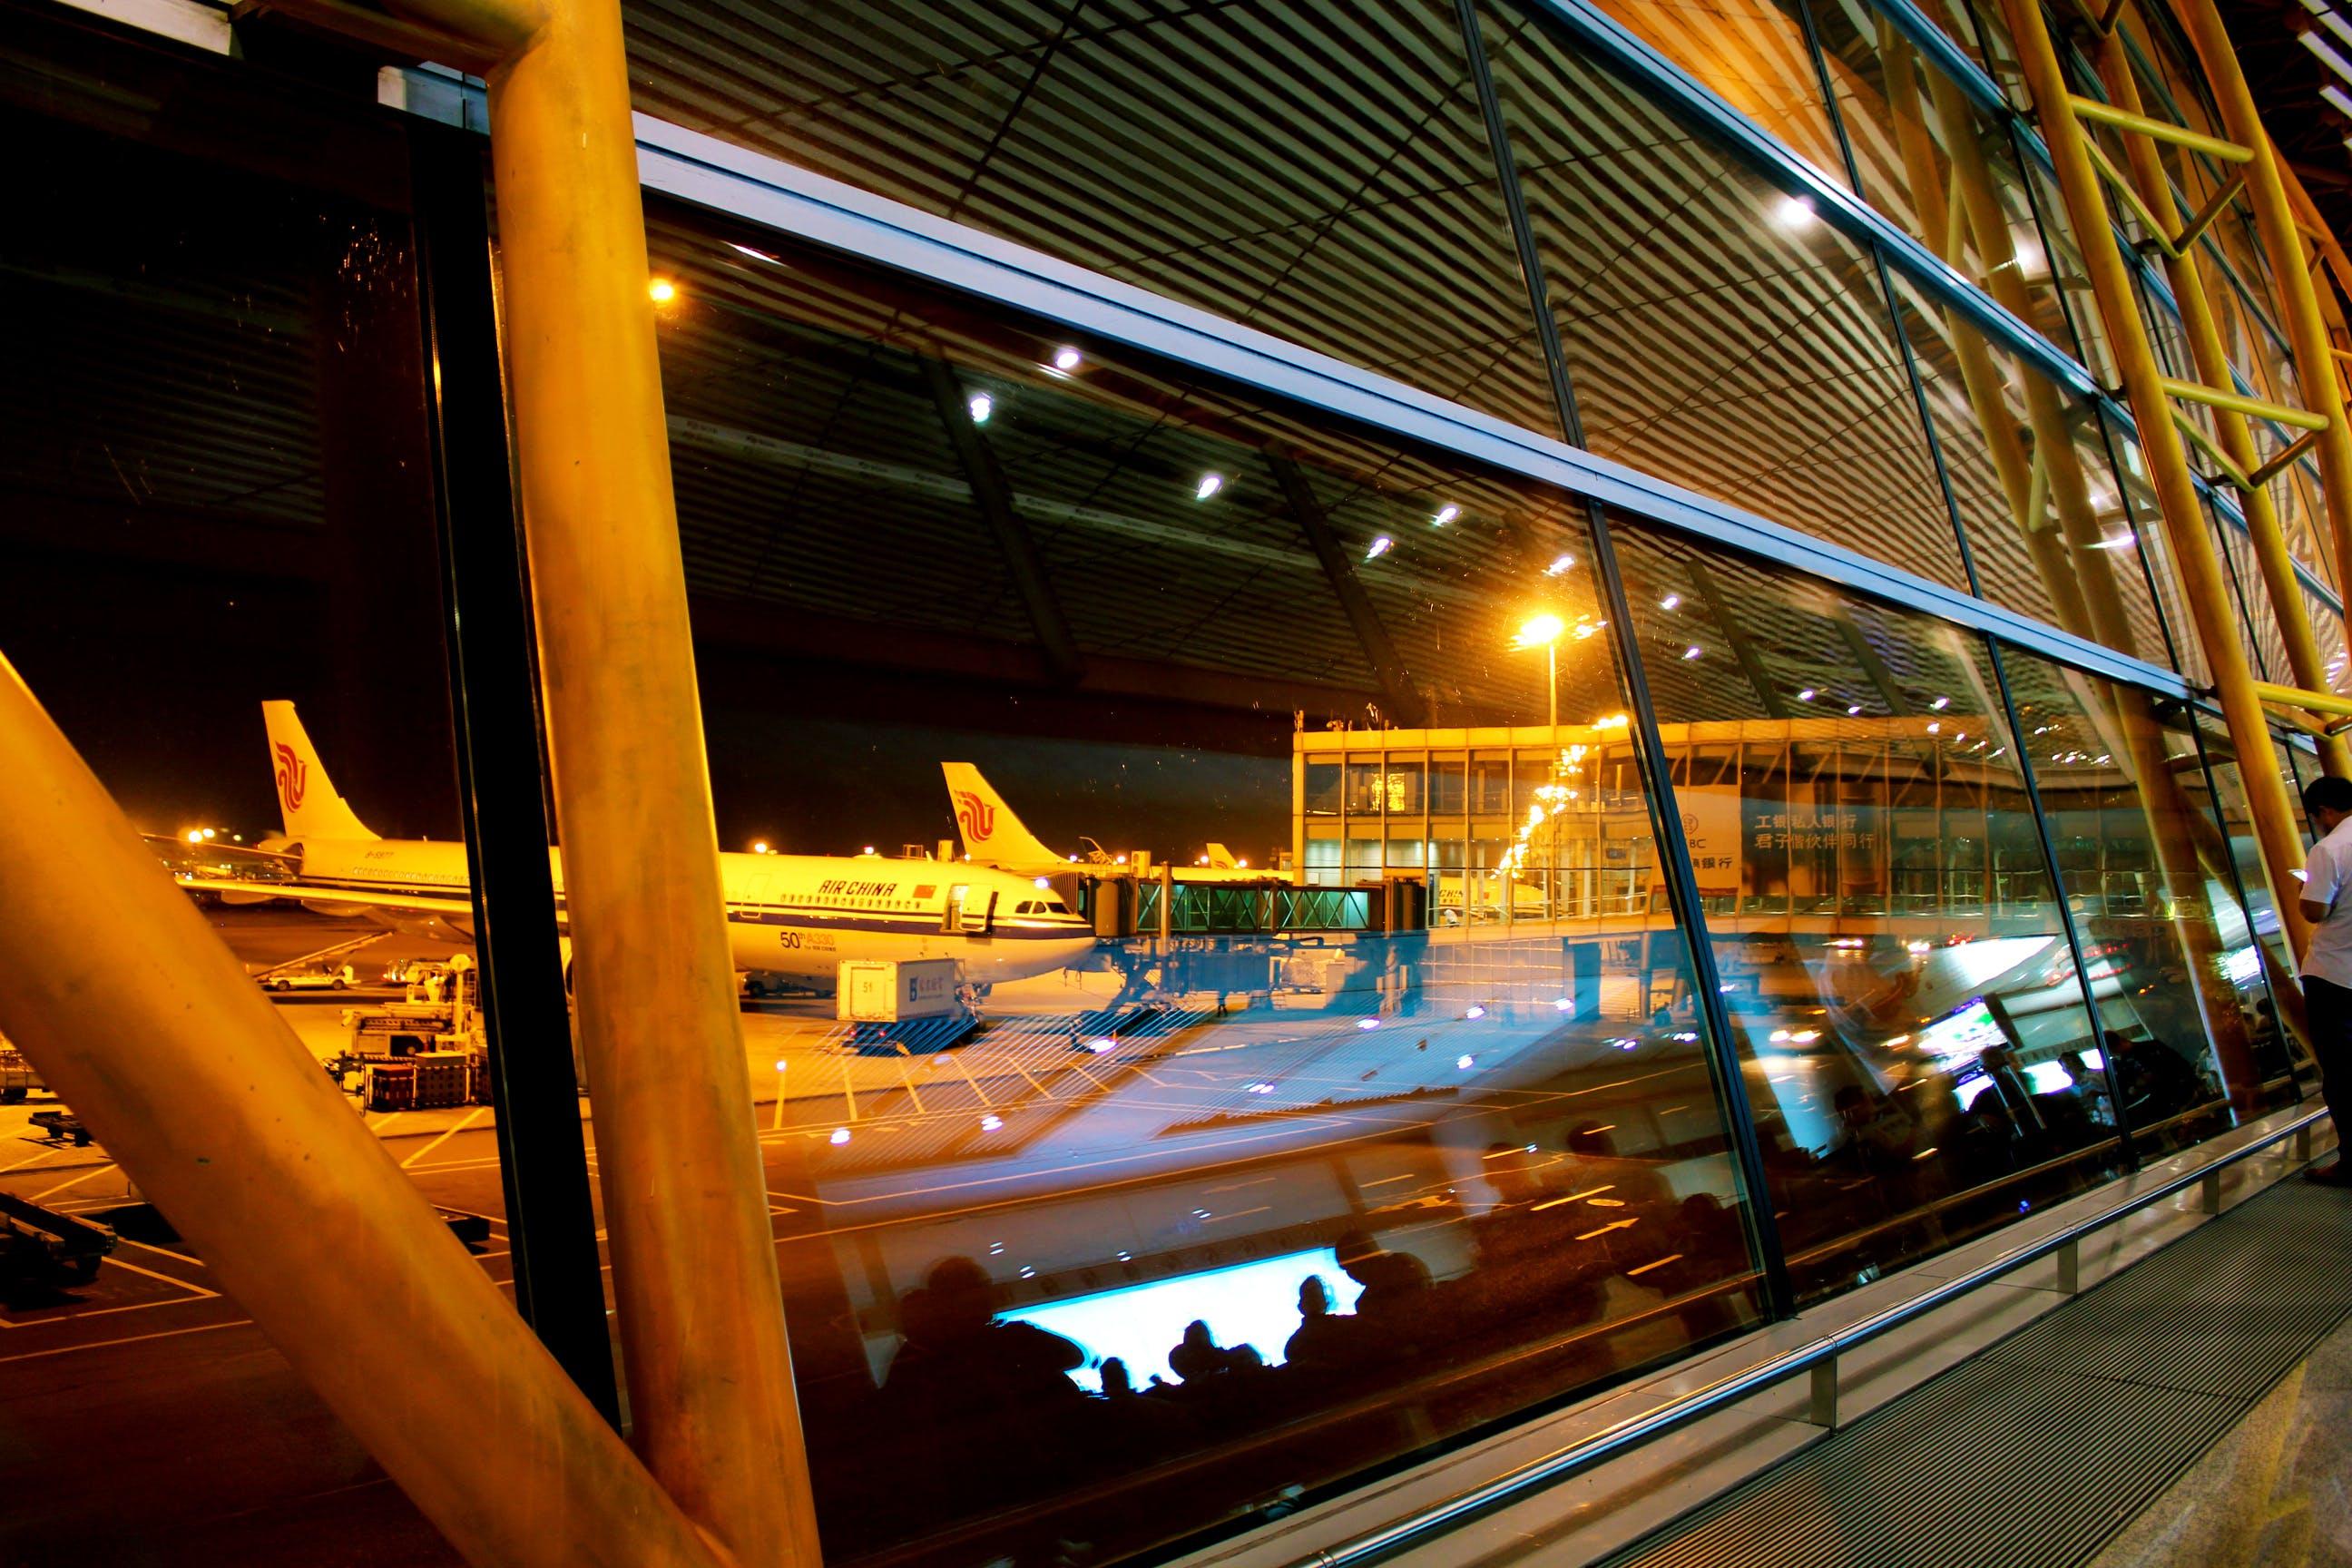 Free stock photo of Beijing Capital International Airport